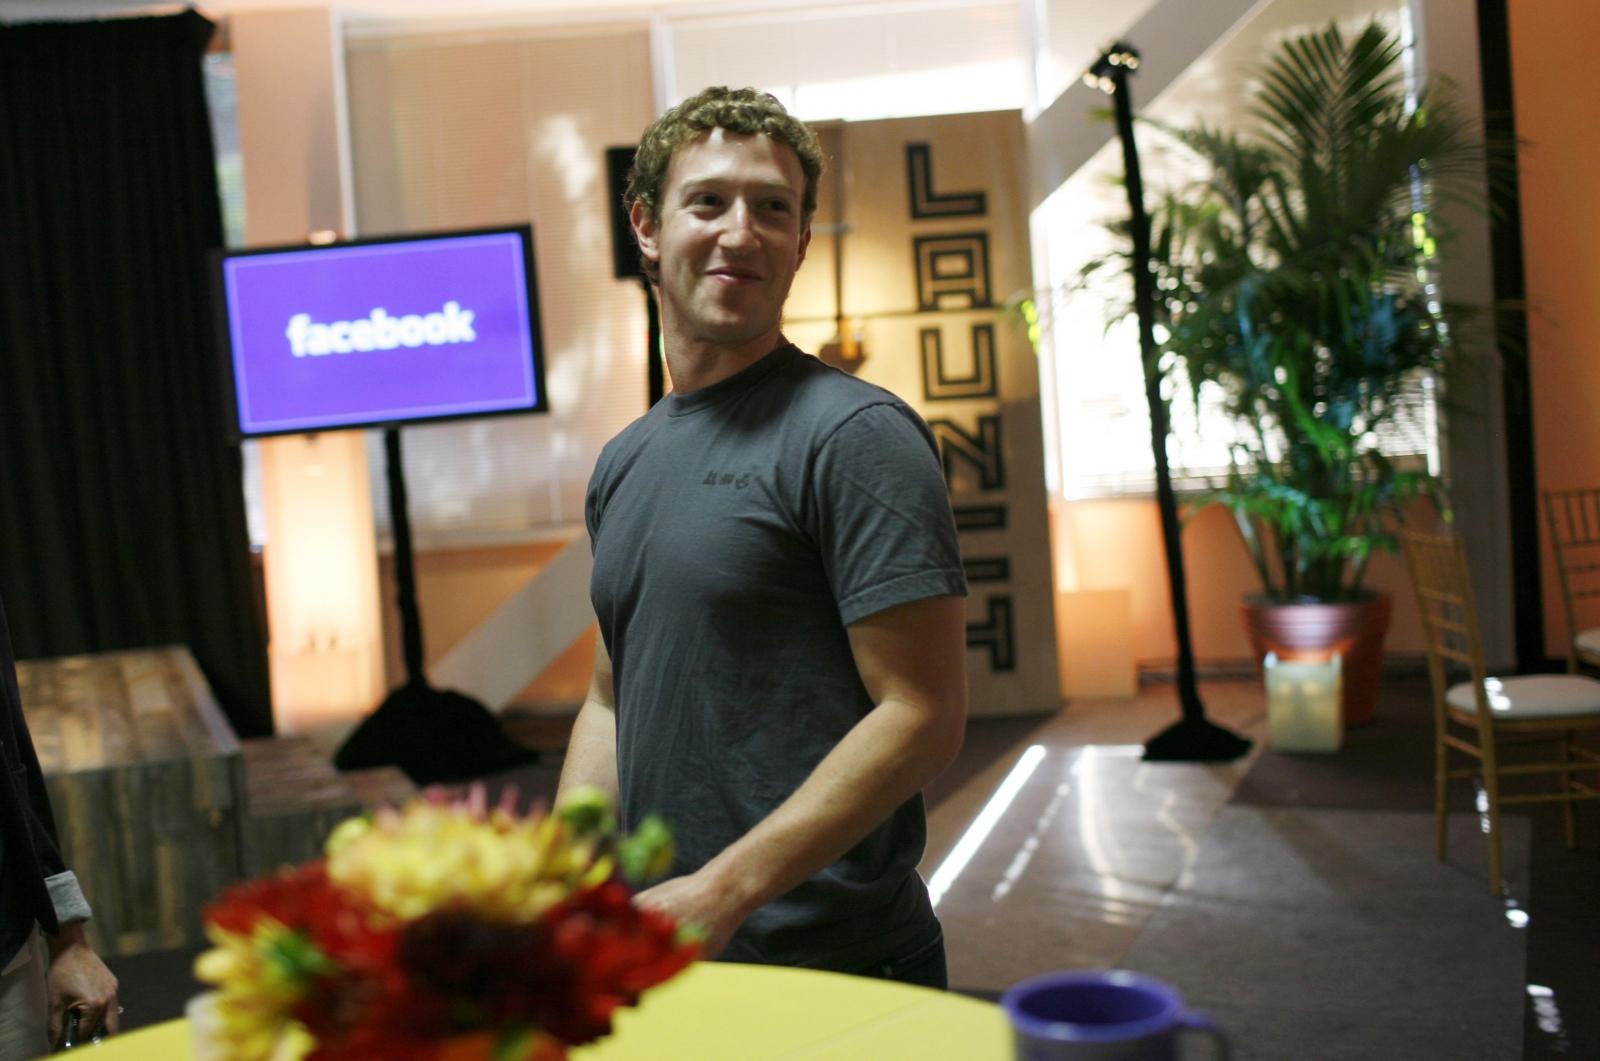 Facebook CEO Mark Zuckerberg in a grey T-shirt (again)